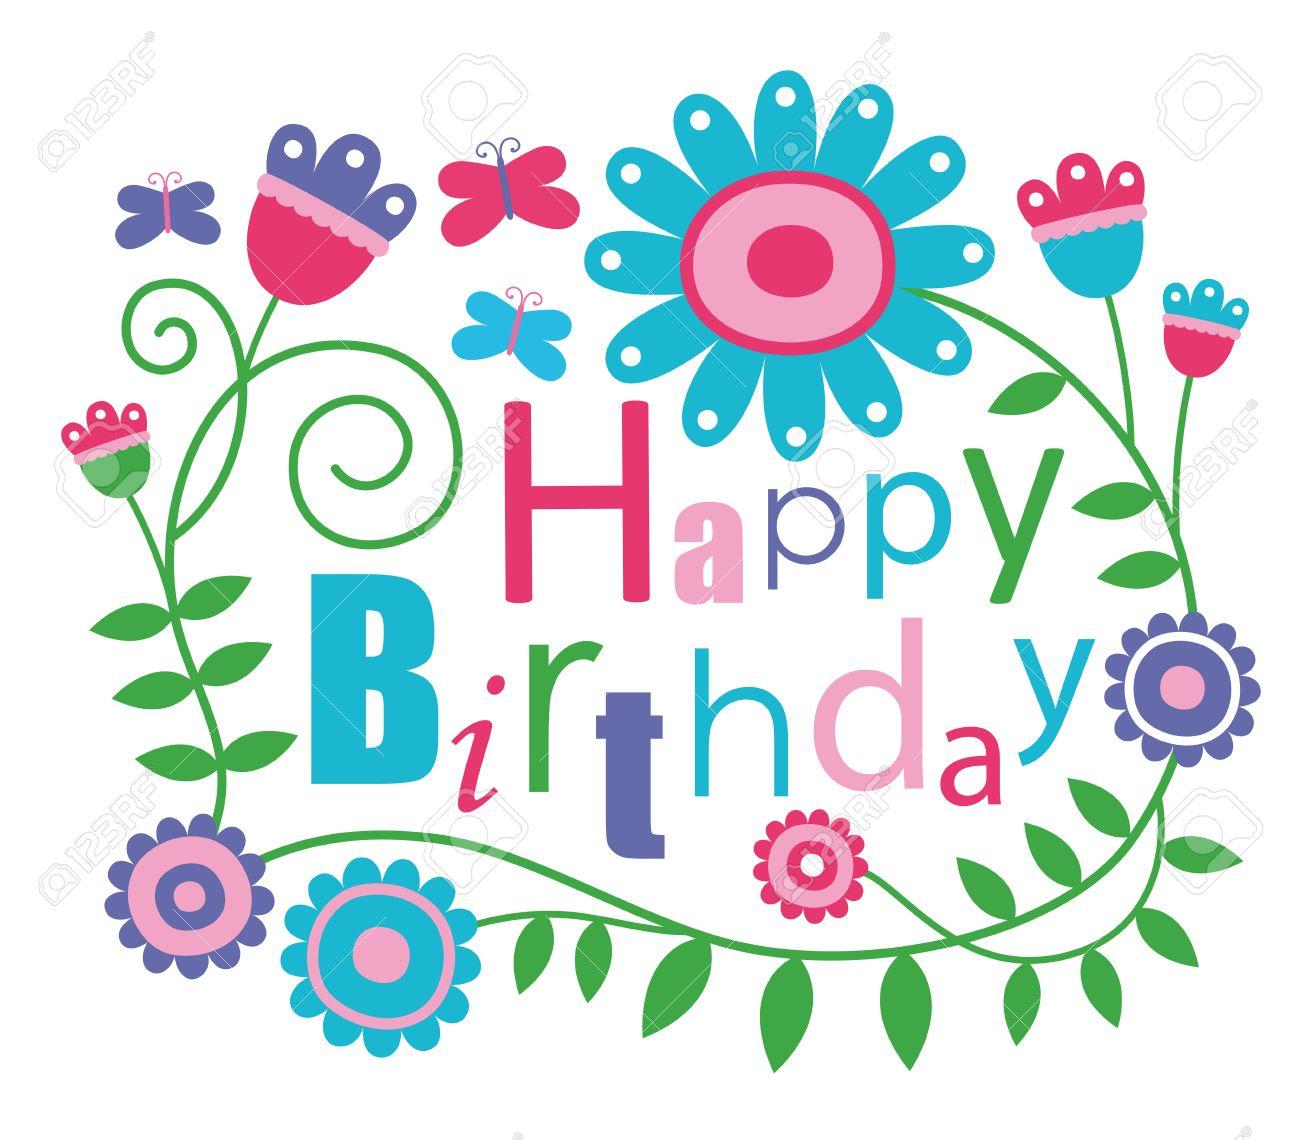 Cute Happy Birthday Card Royalty Free Cliparts Vectors And – Cute Happy Birthday Cards